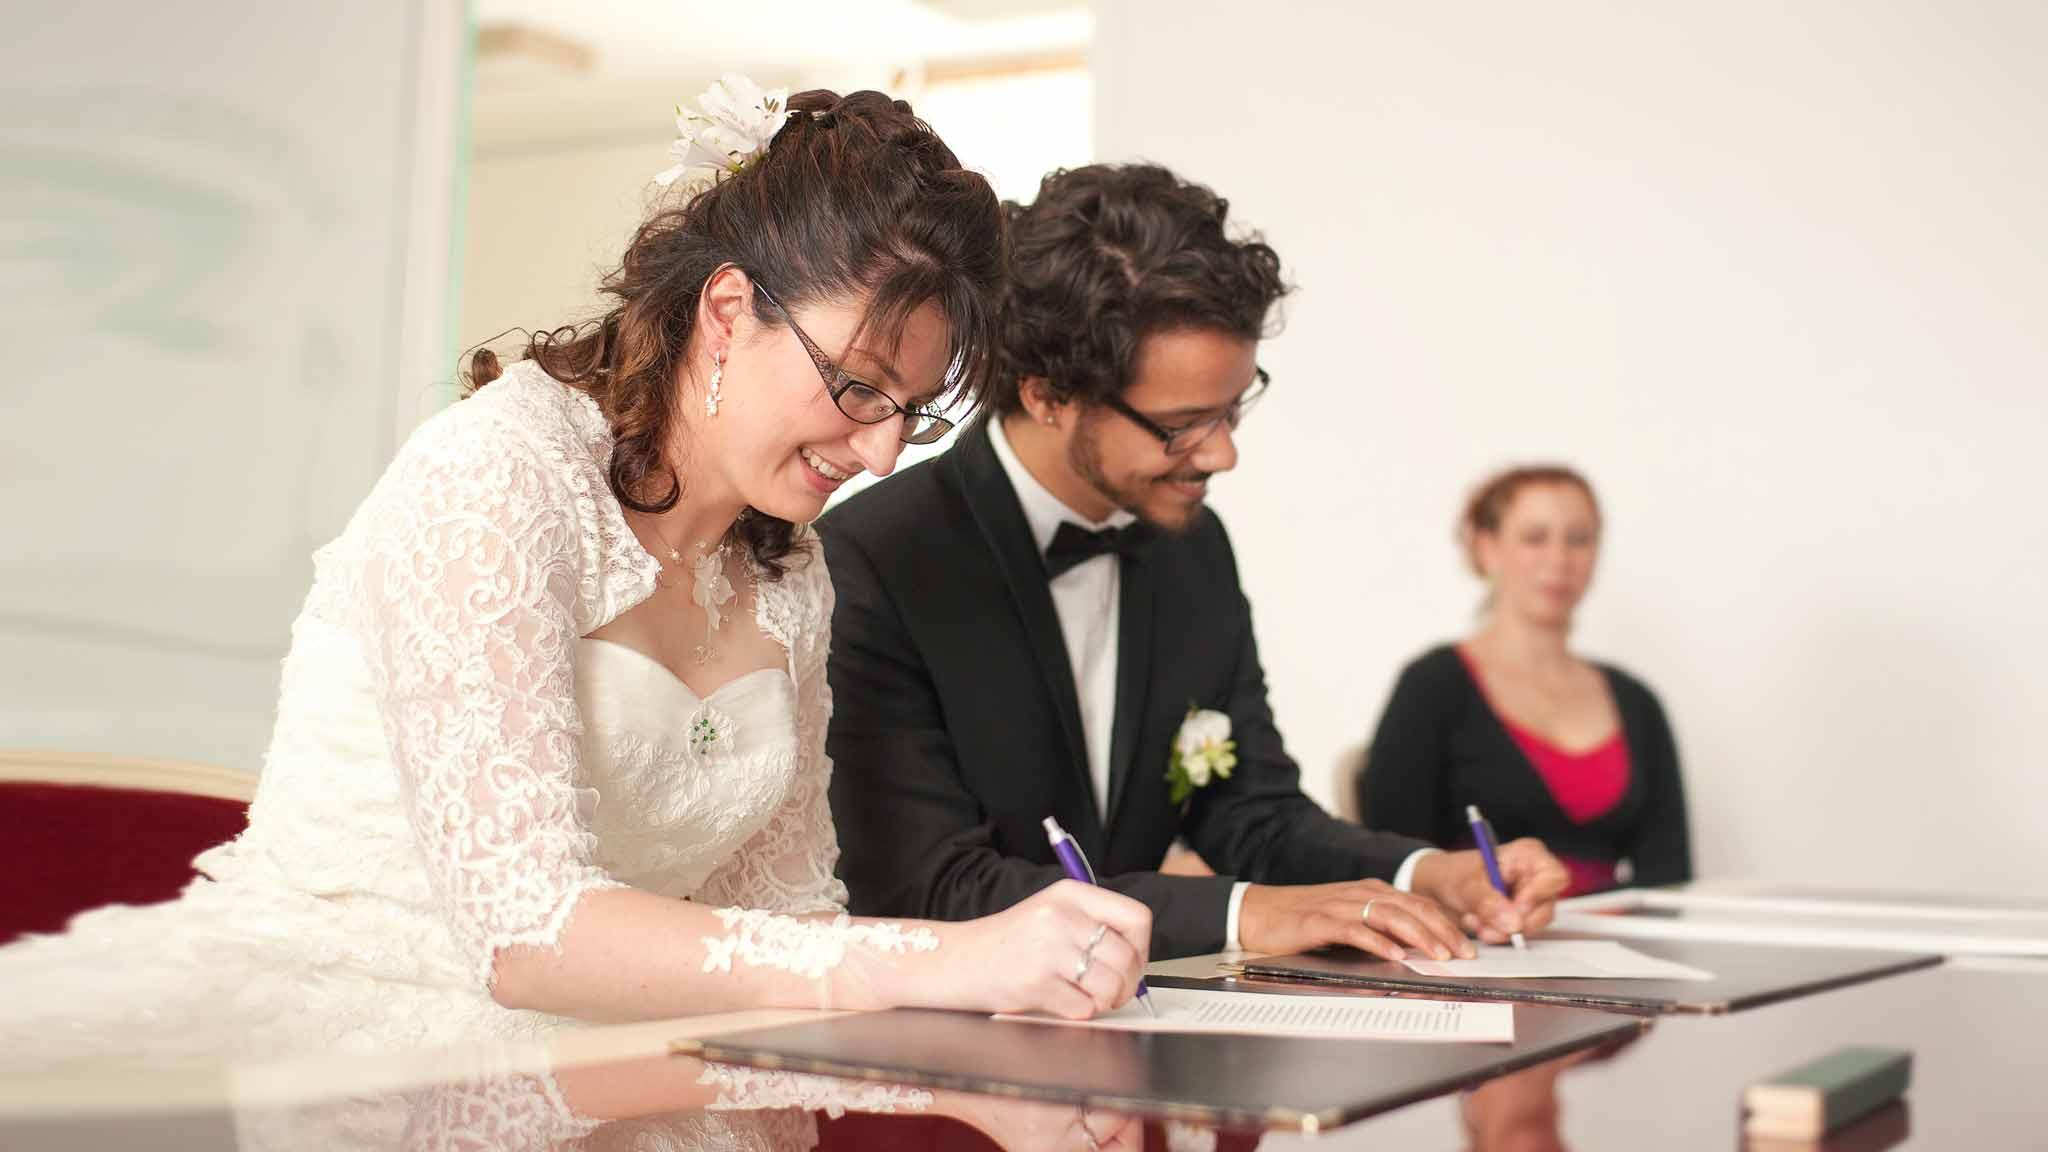 portrait-mairie-reportage-photographe-mariage-nancy-metz-strasbourg-wedding-photographer